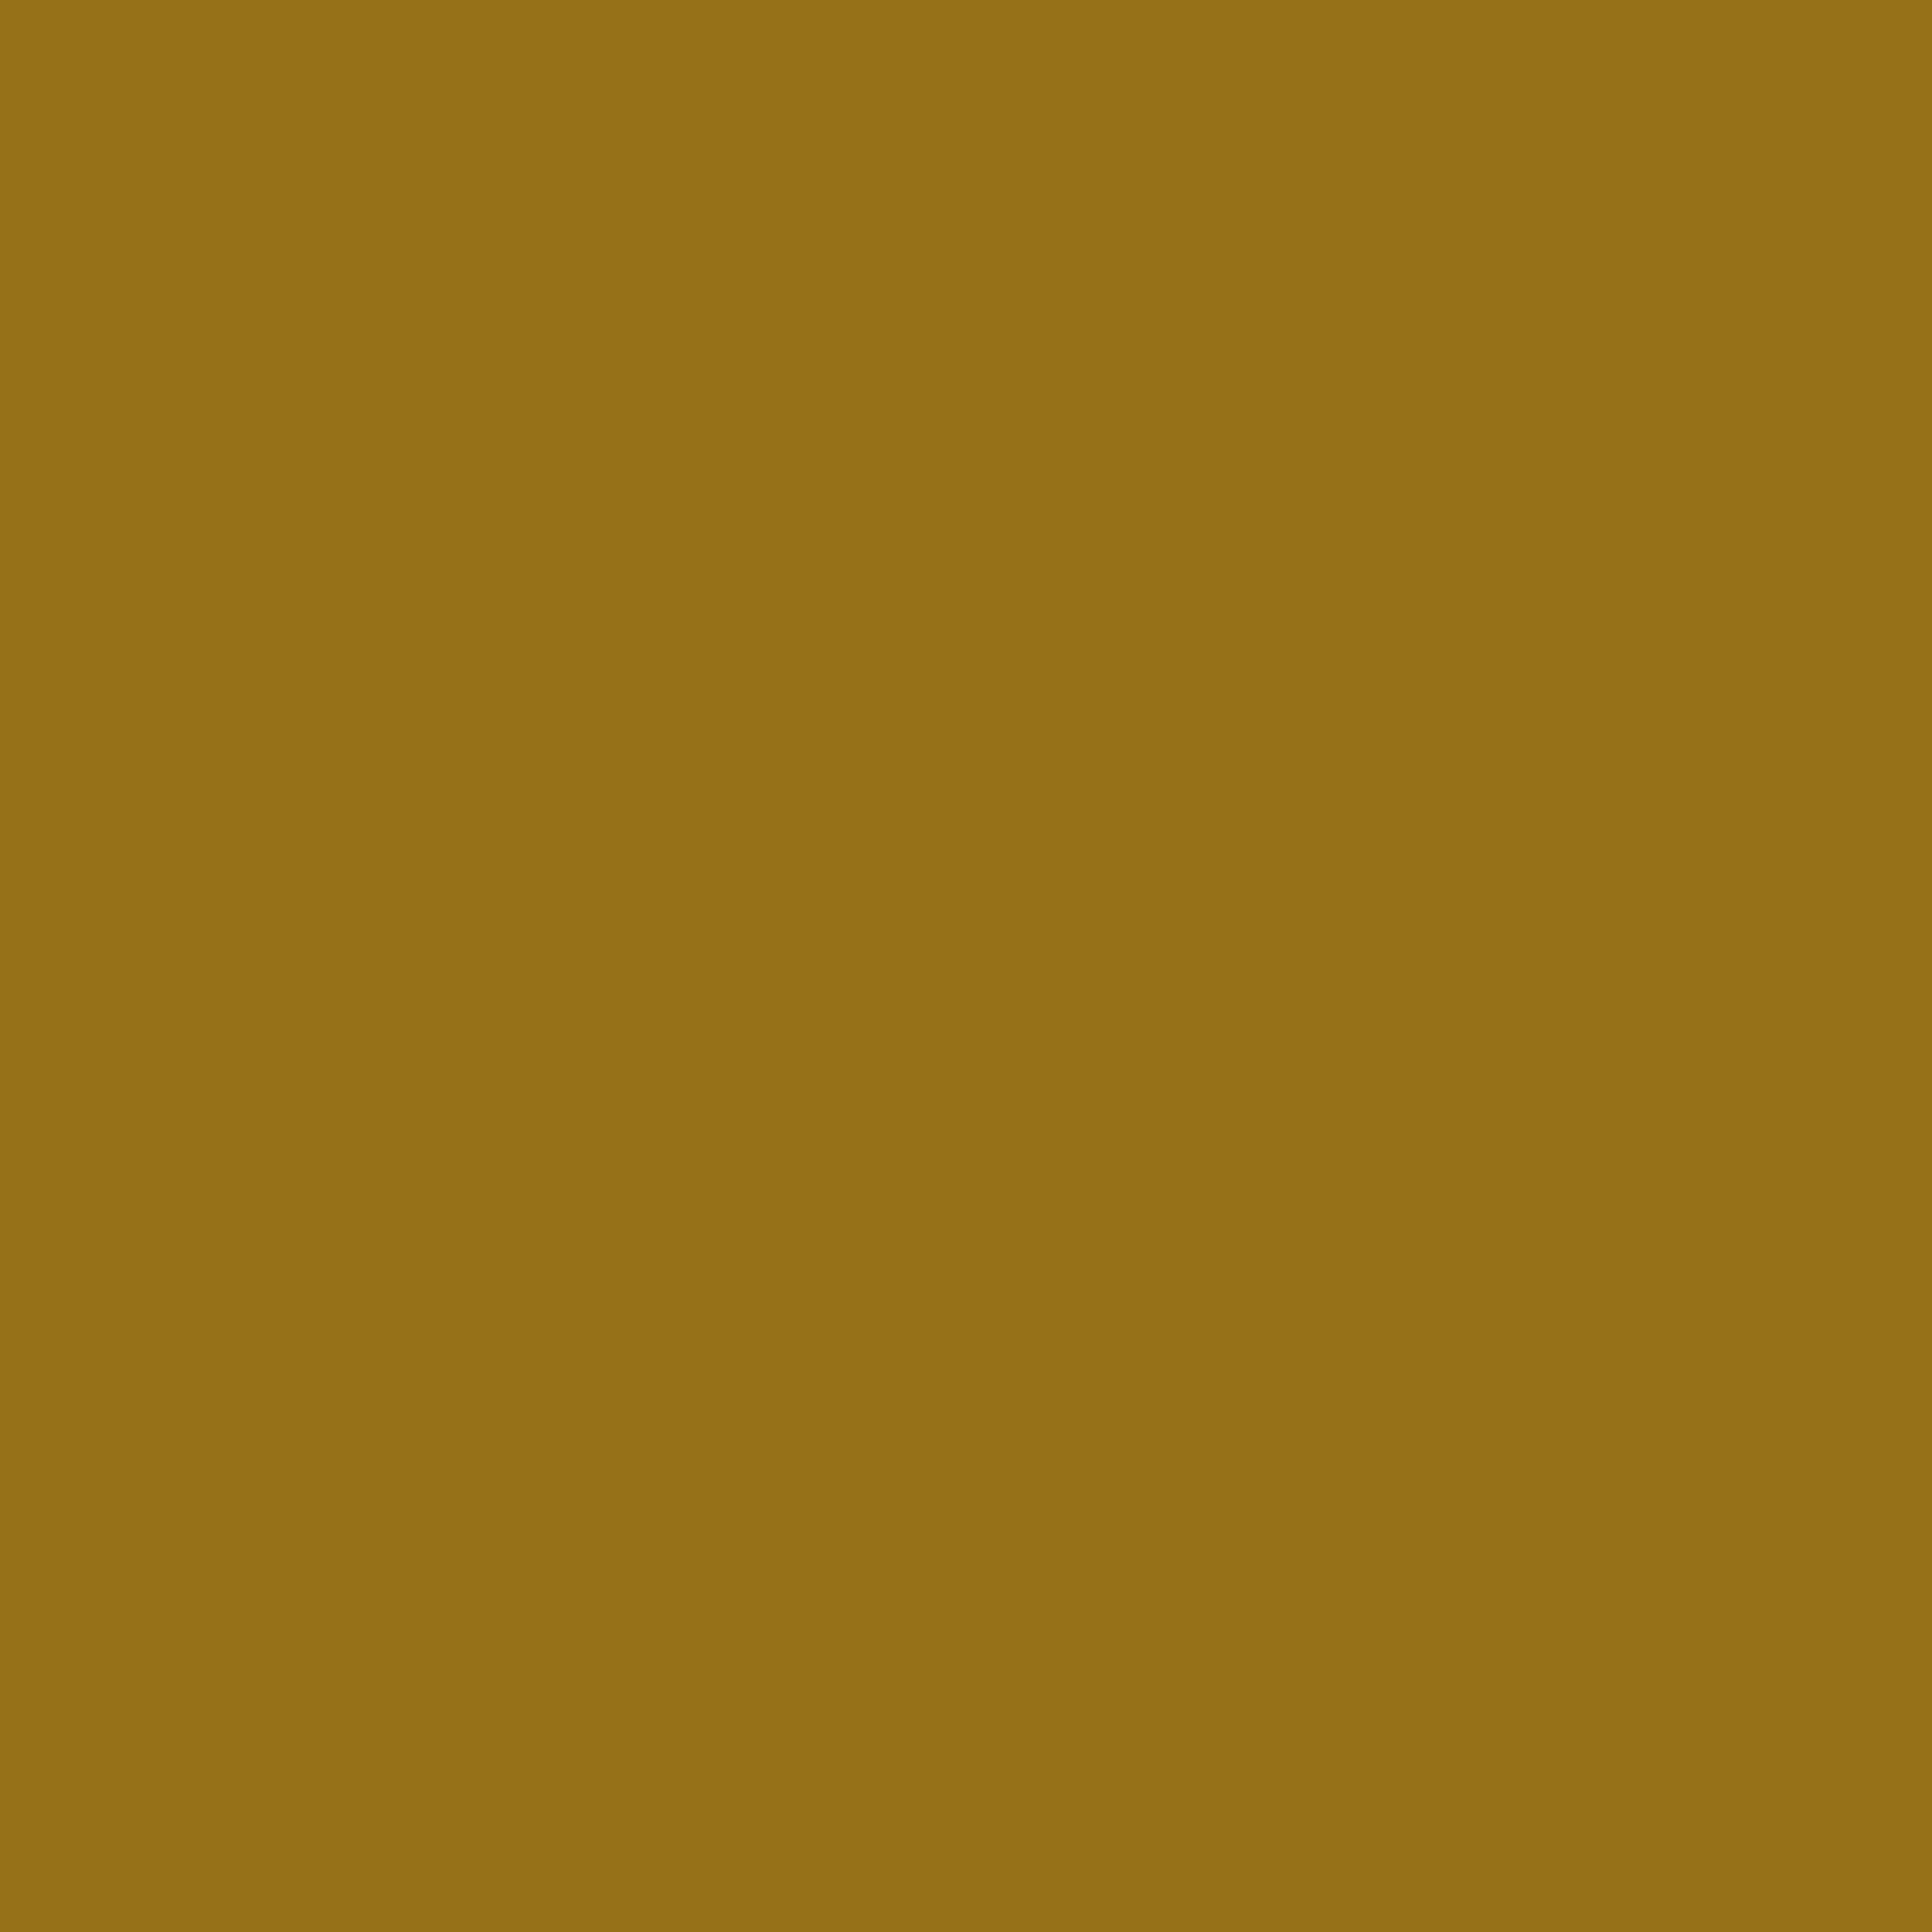 2732x2732 Mode Beige Solid Color Background